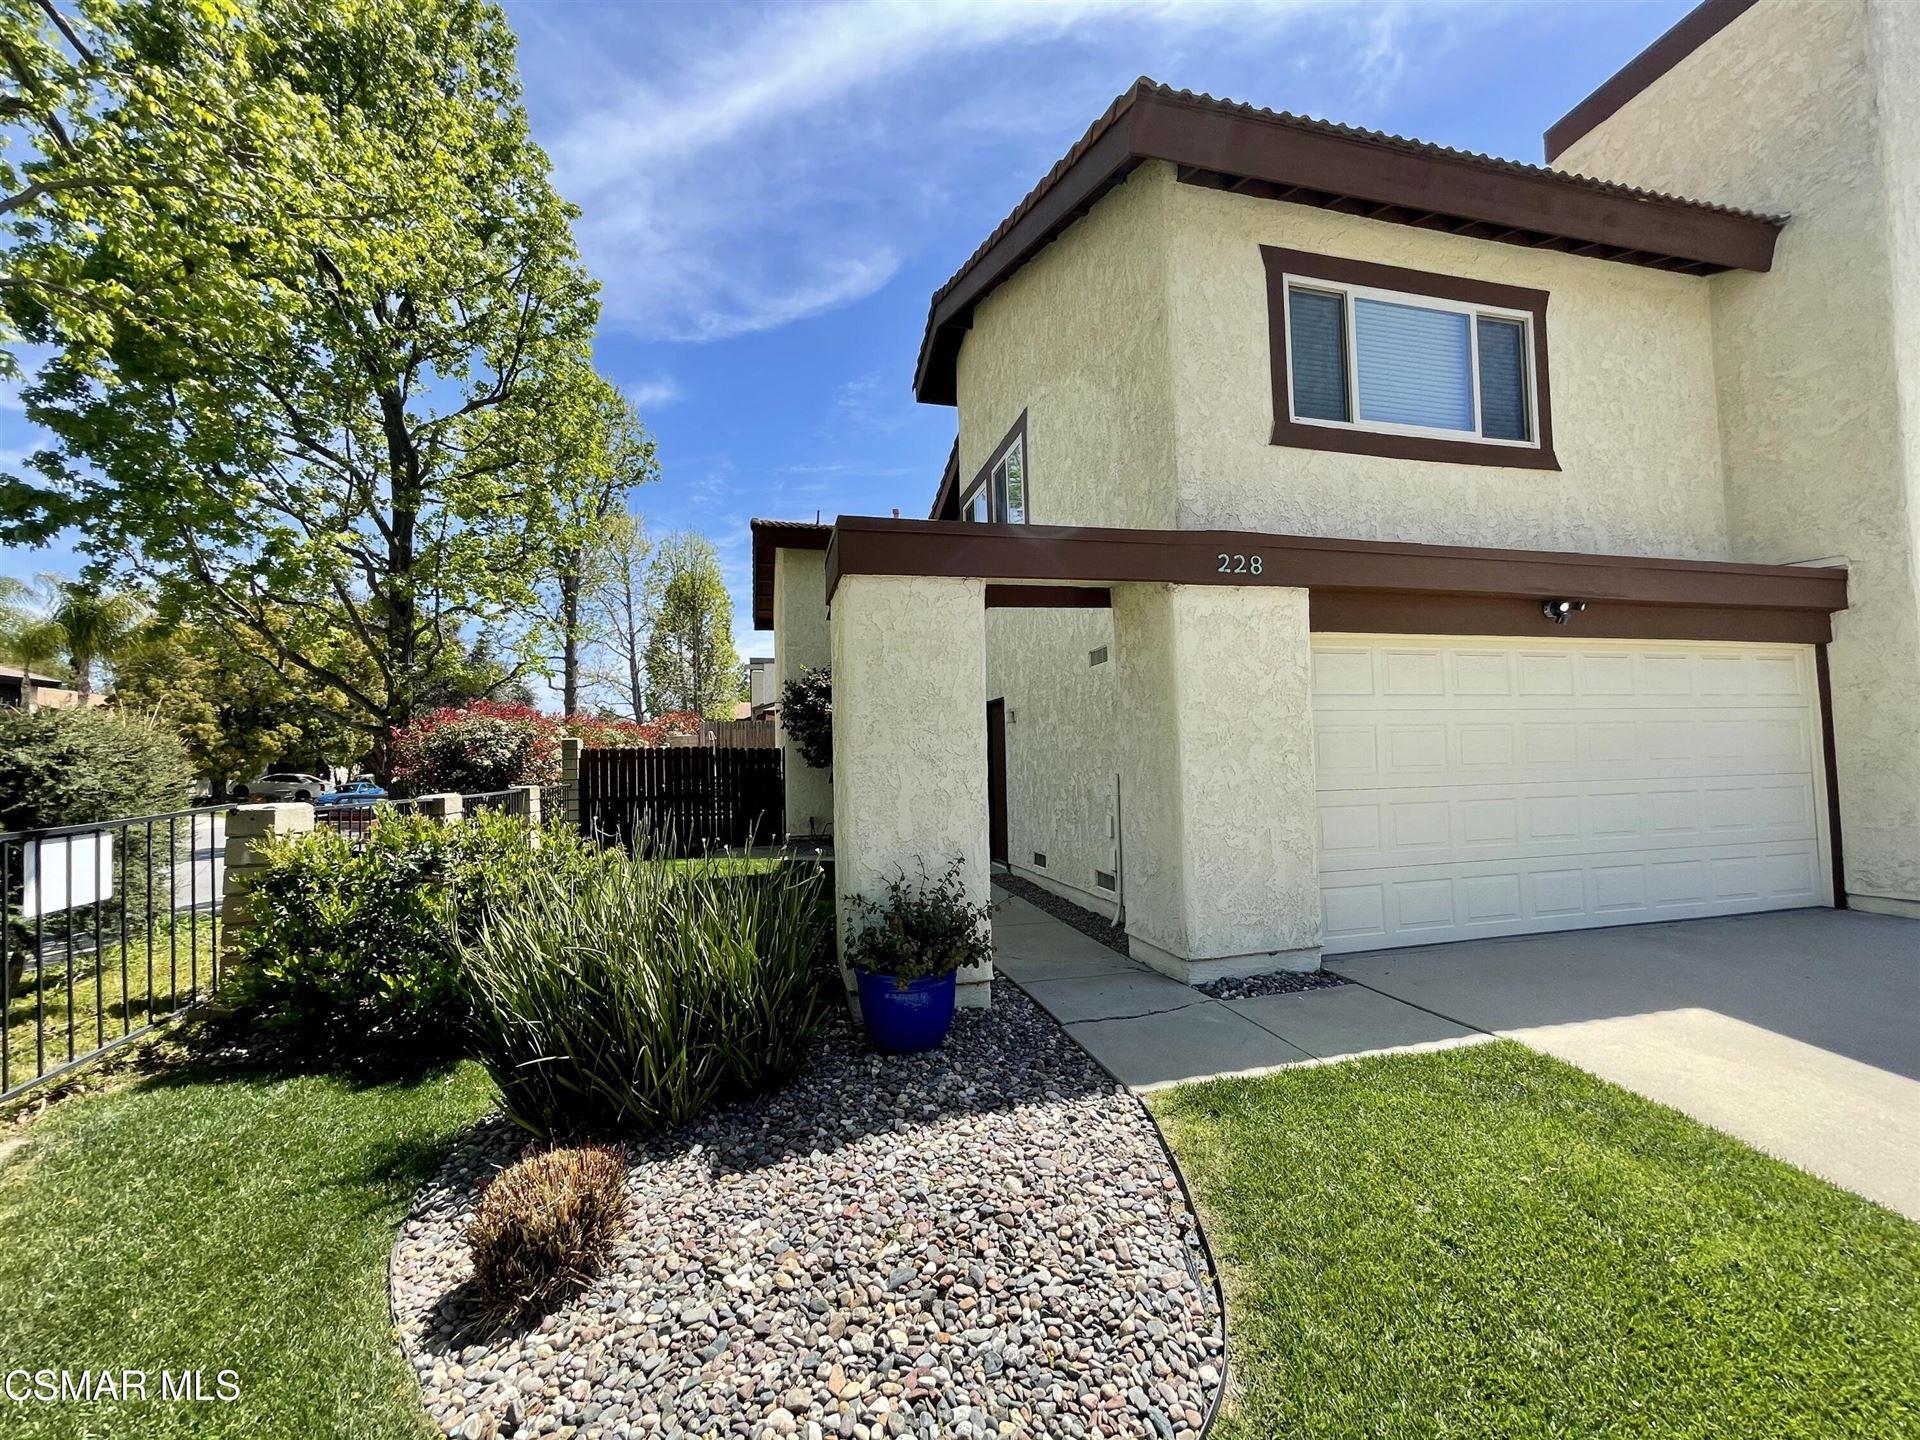 228 N E Kelley Road, Newbury Park, CA 91320 - MLS#: 221001957